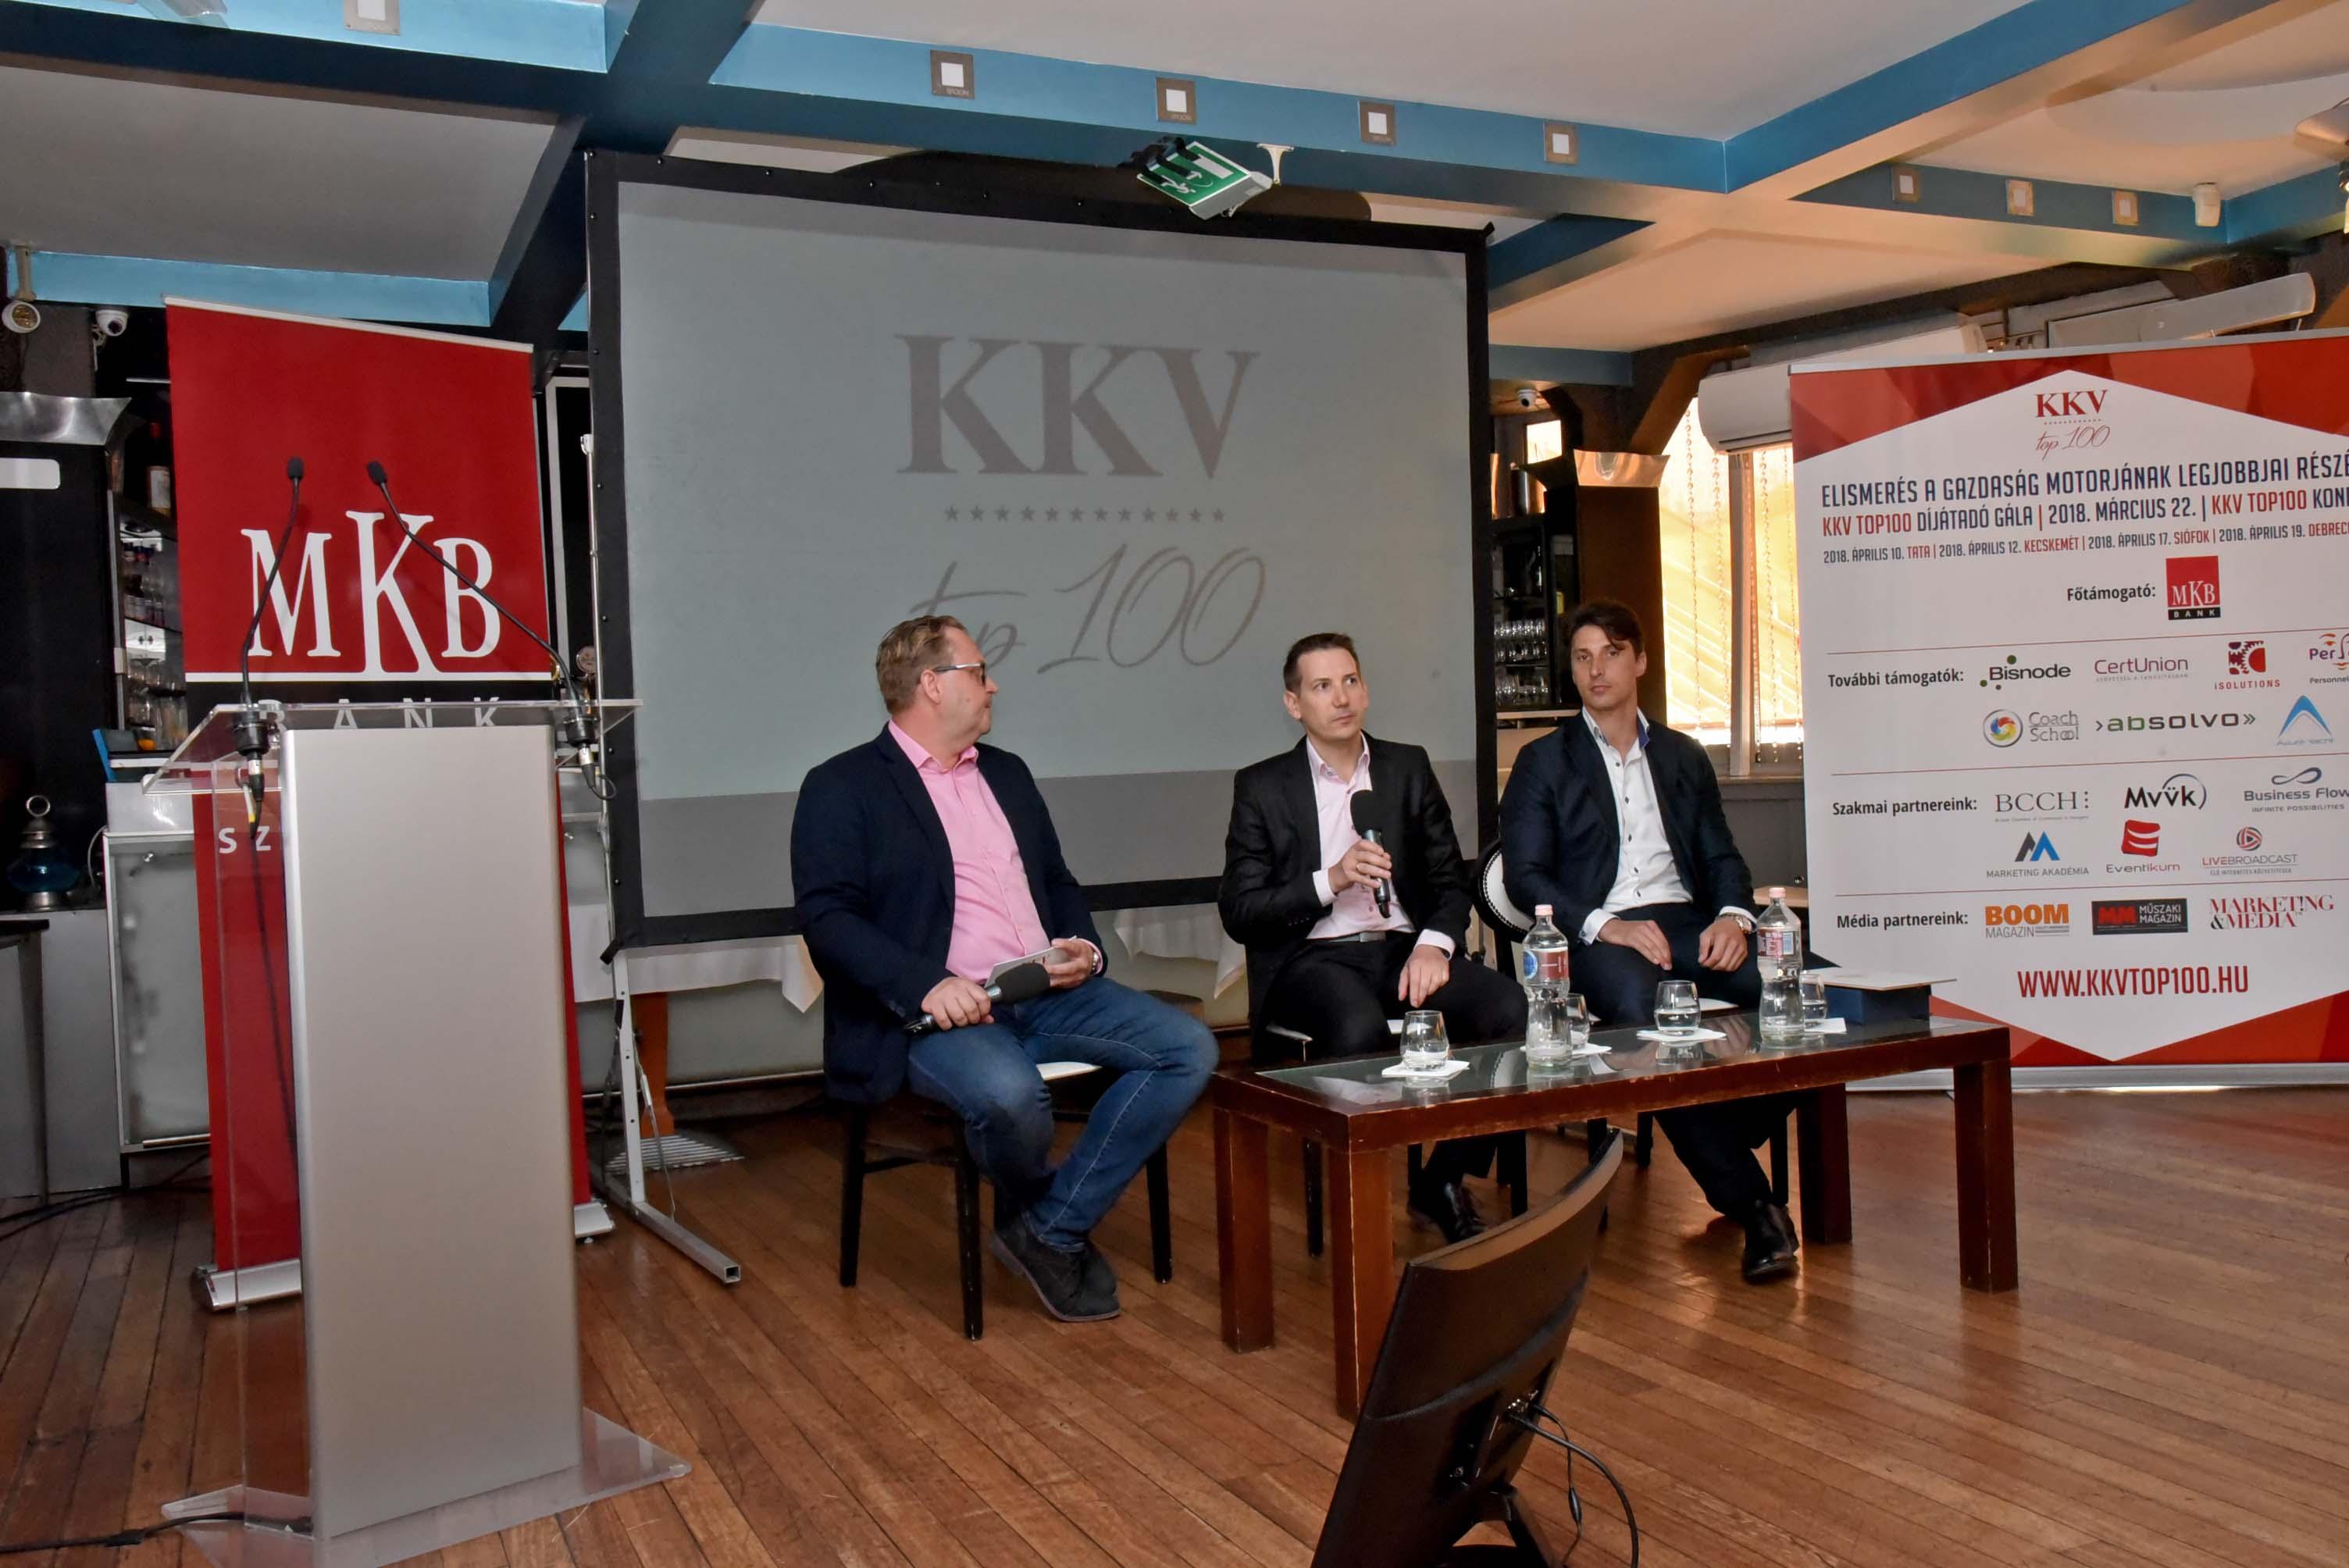 KKV TOP 100 konferencia Budapesten